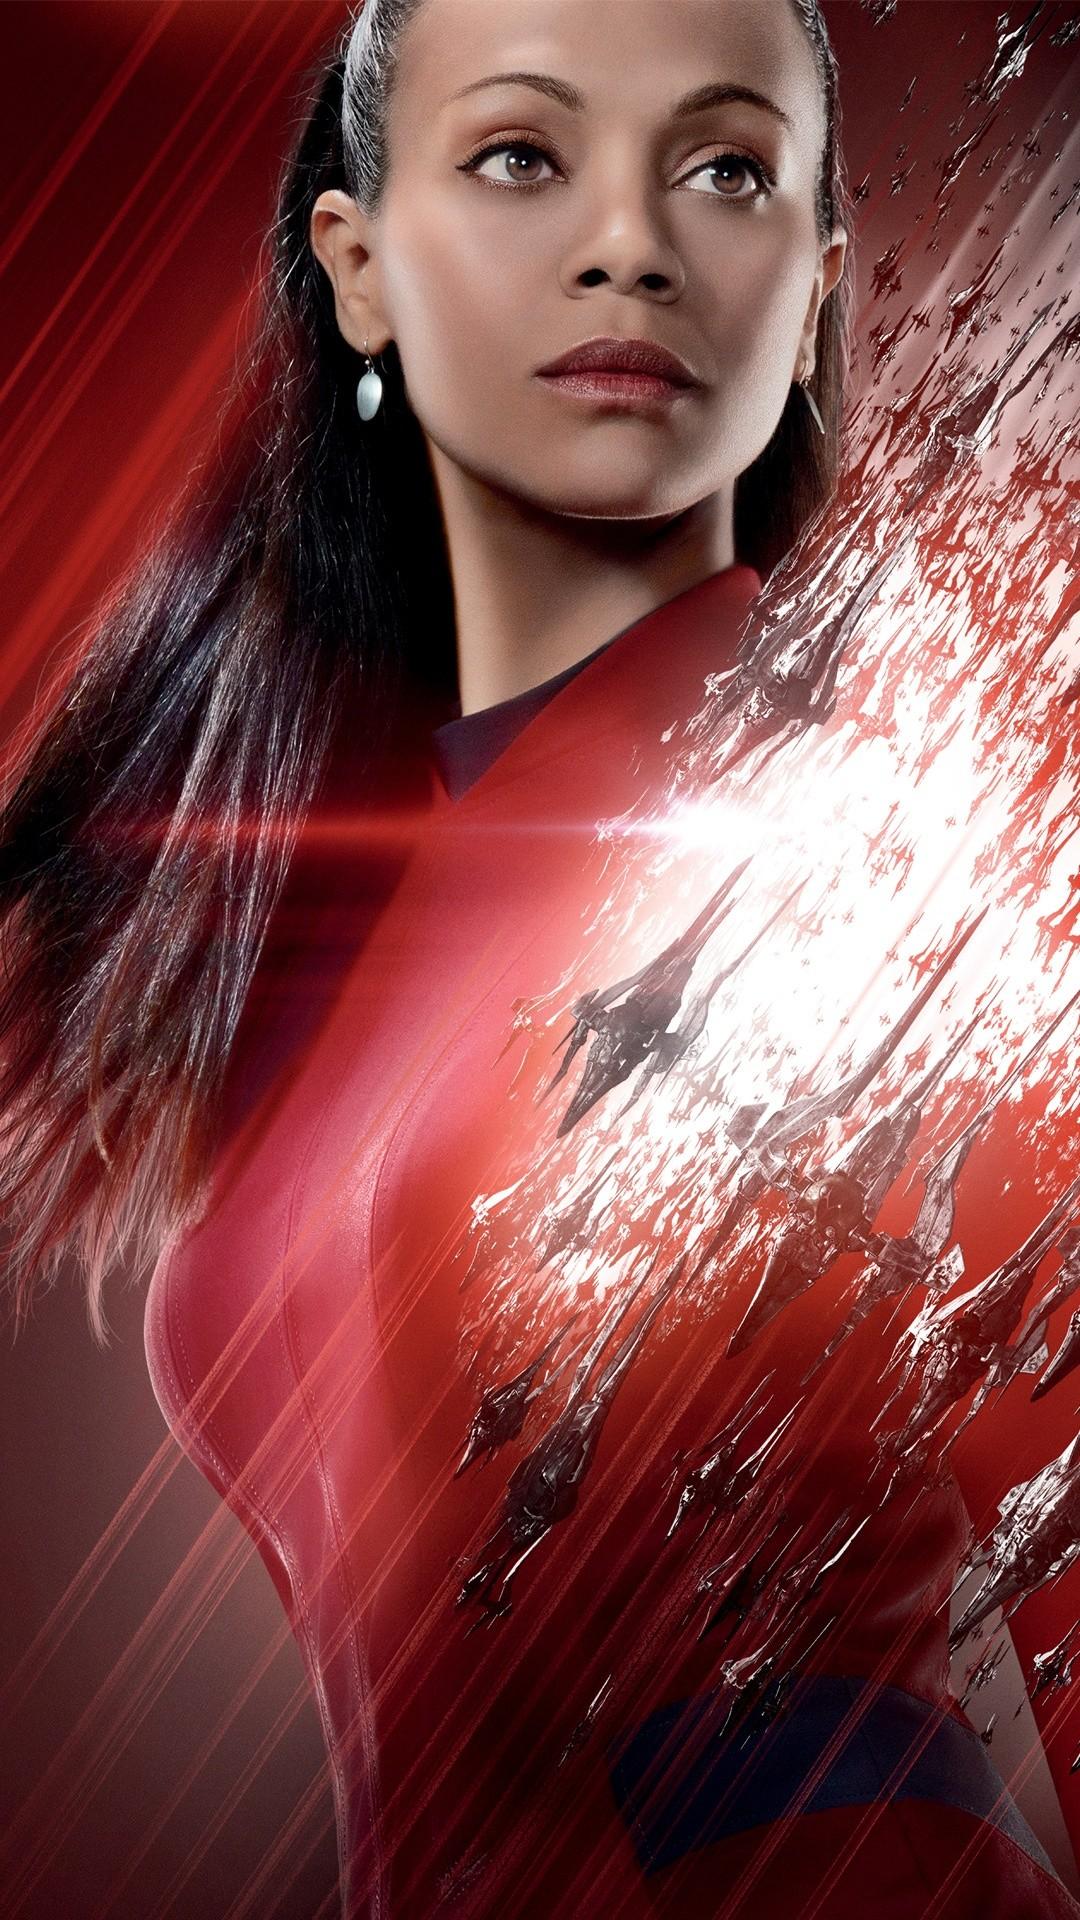 Zoe Saldana Star Trek Beyond Wallpapers